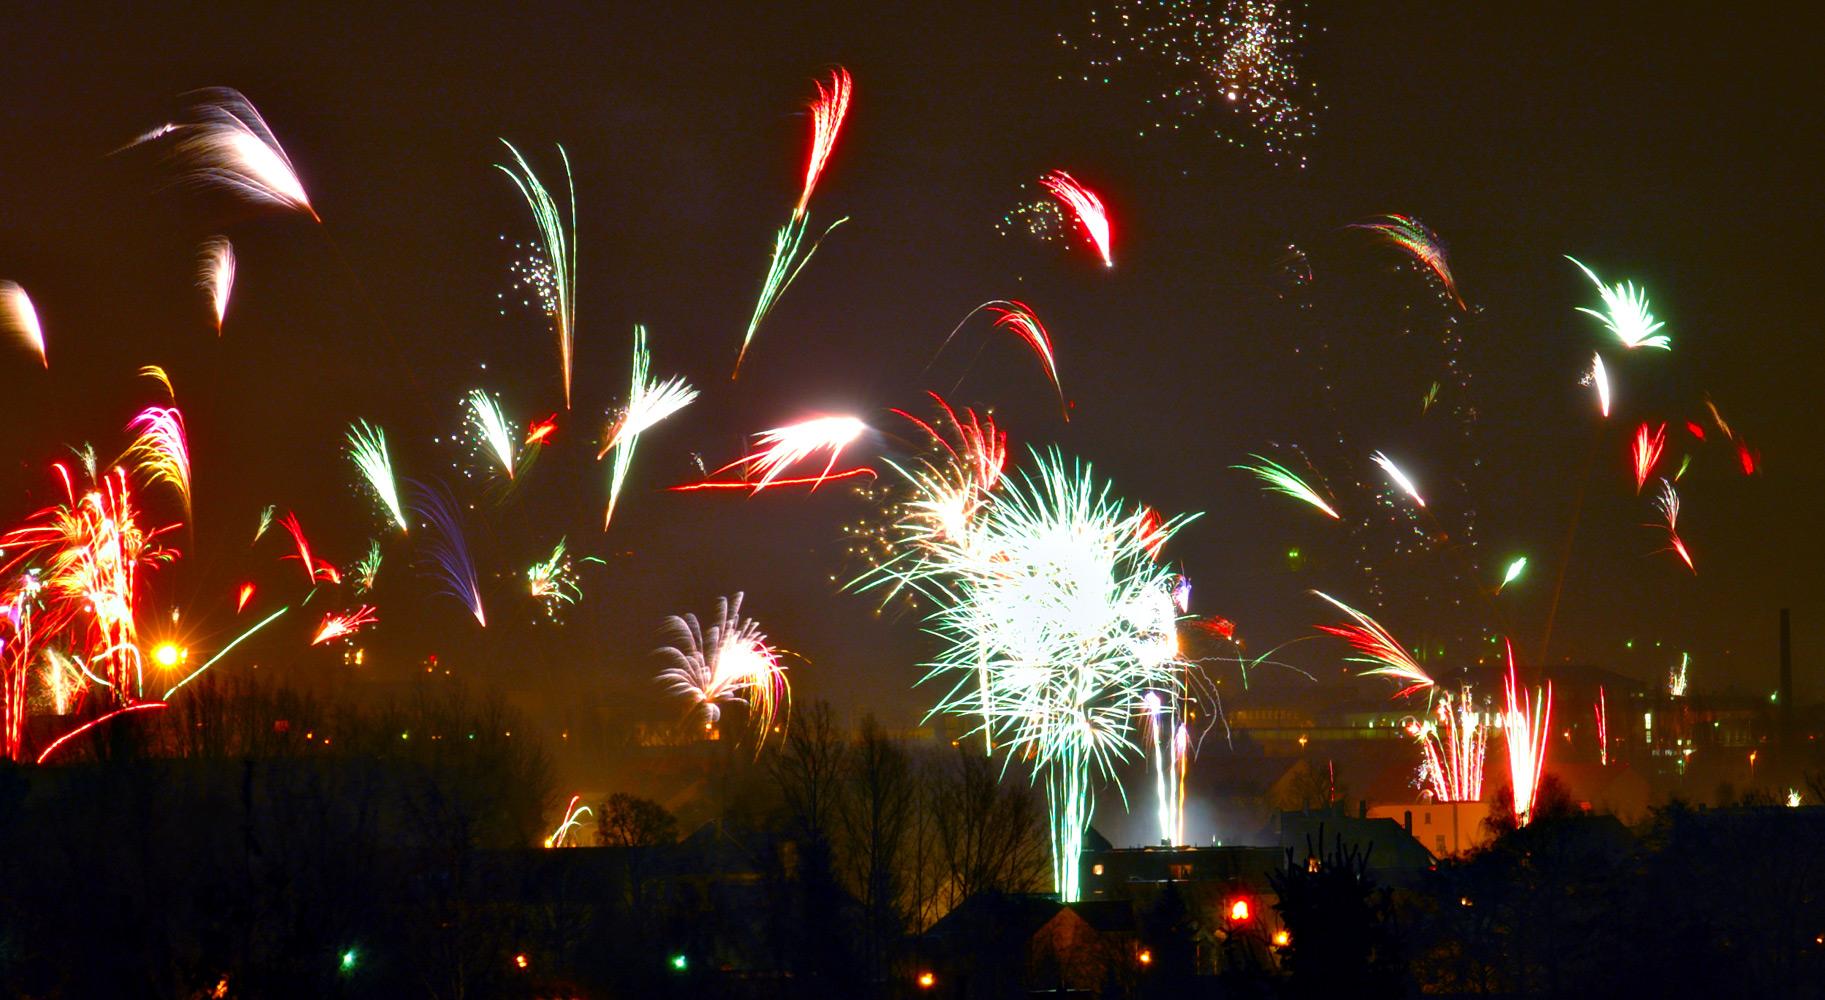 Fireworks in Zwickau by André Karwath aka Aka - Eigenes Werk